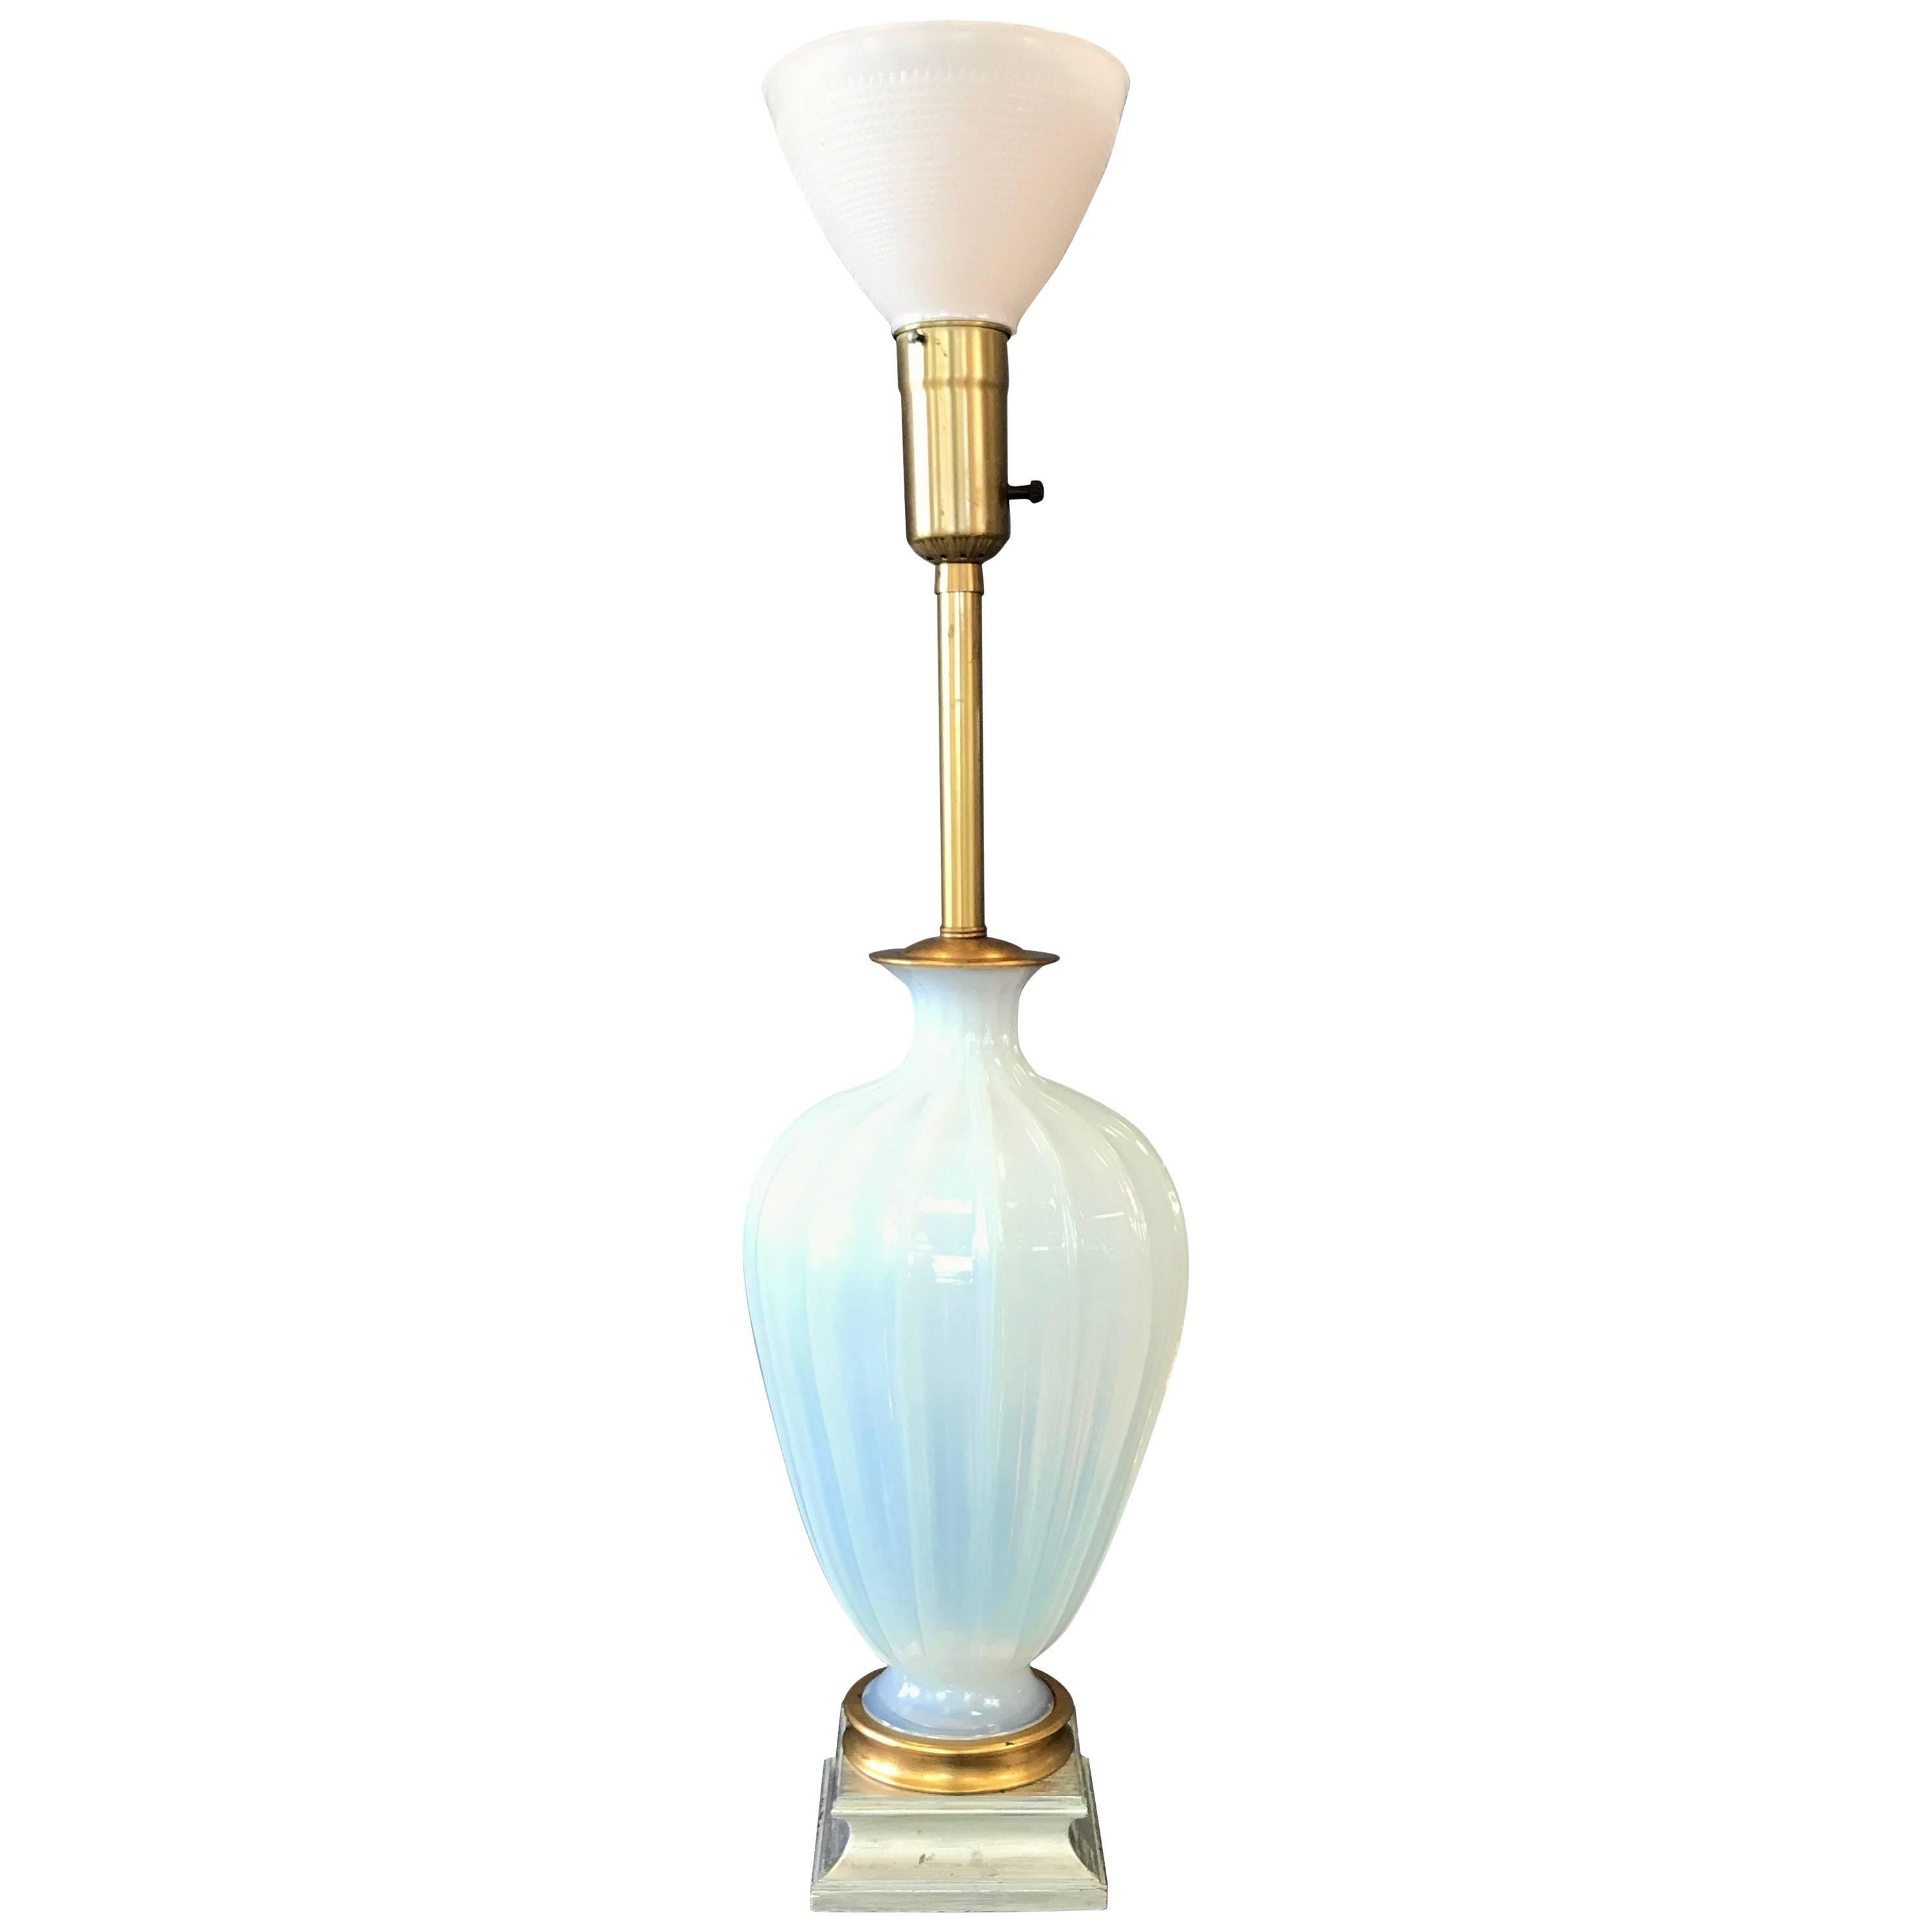 Seguso for Marbro Large Murano Glass Opaline Lamp